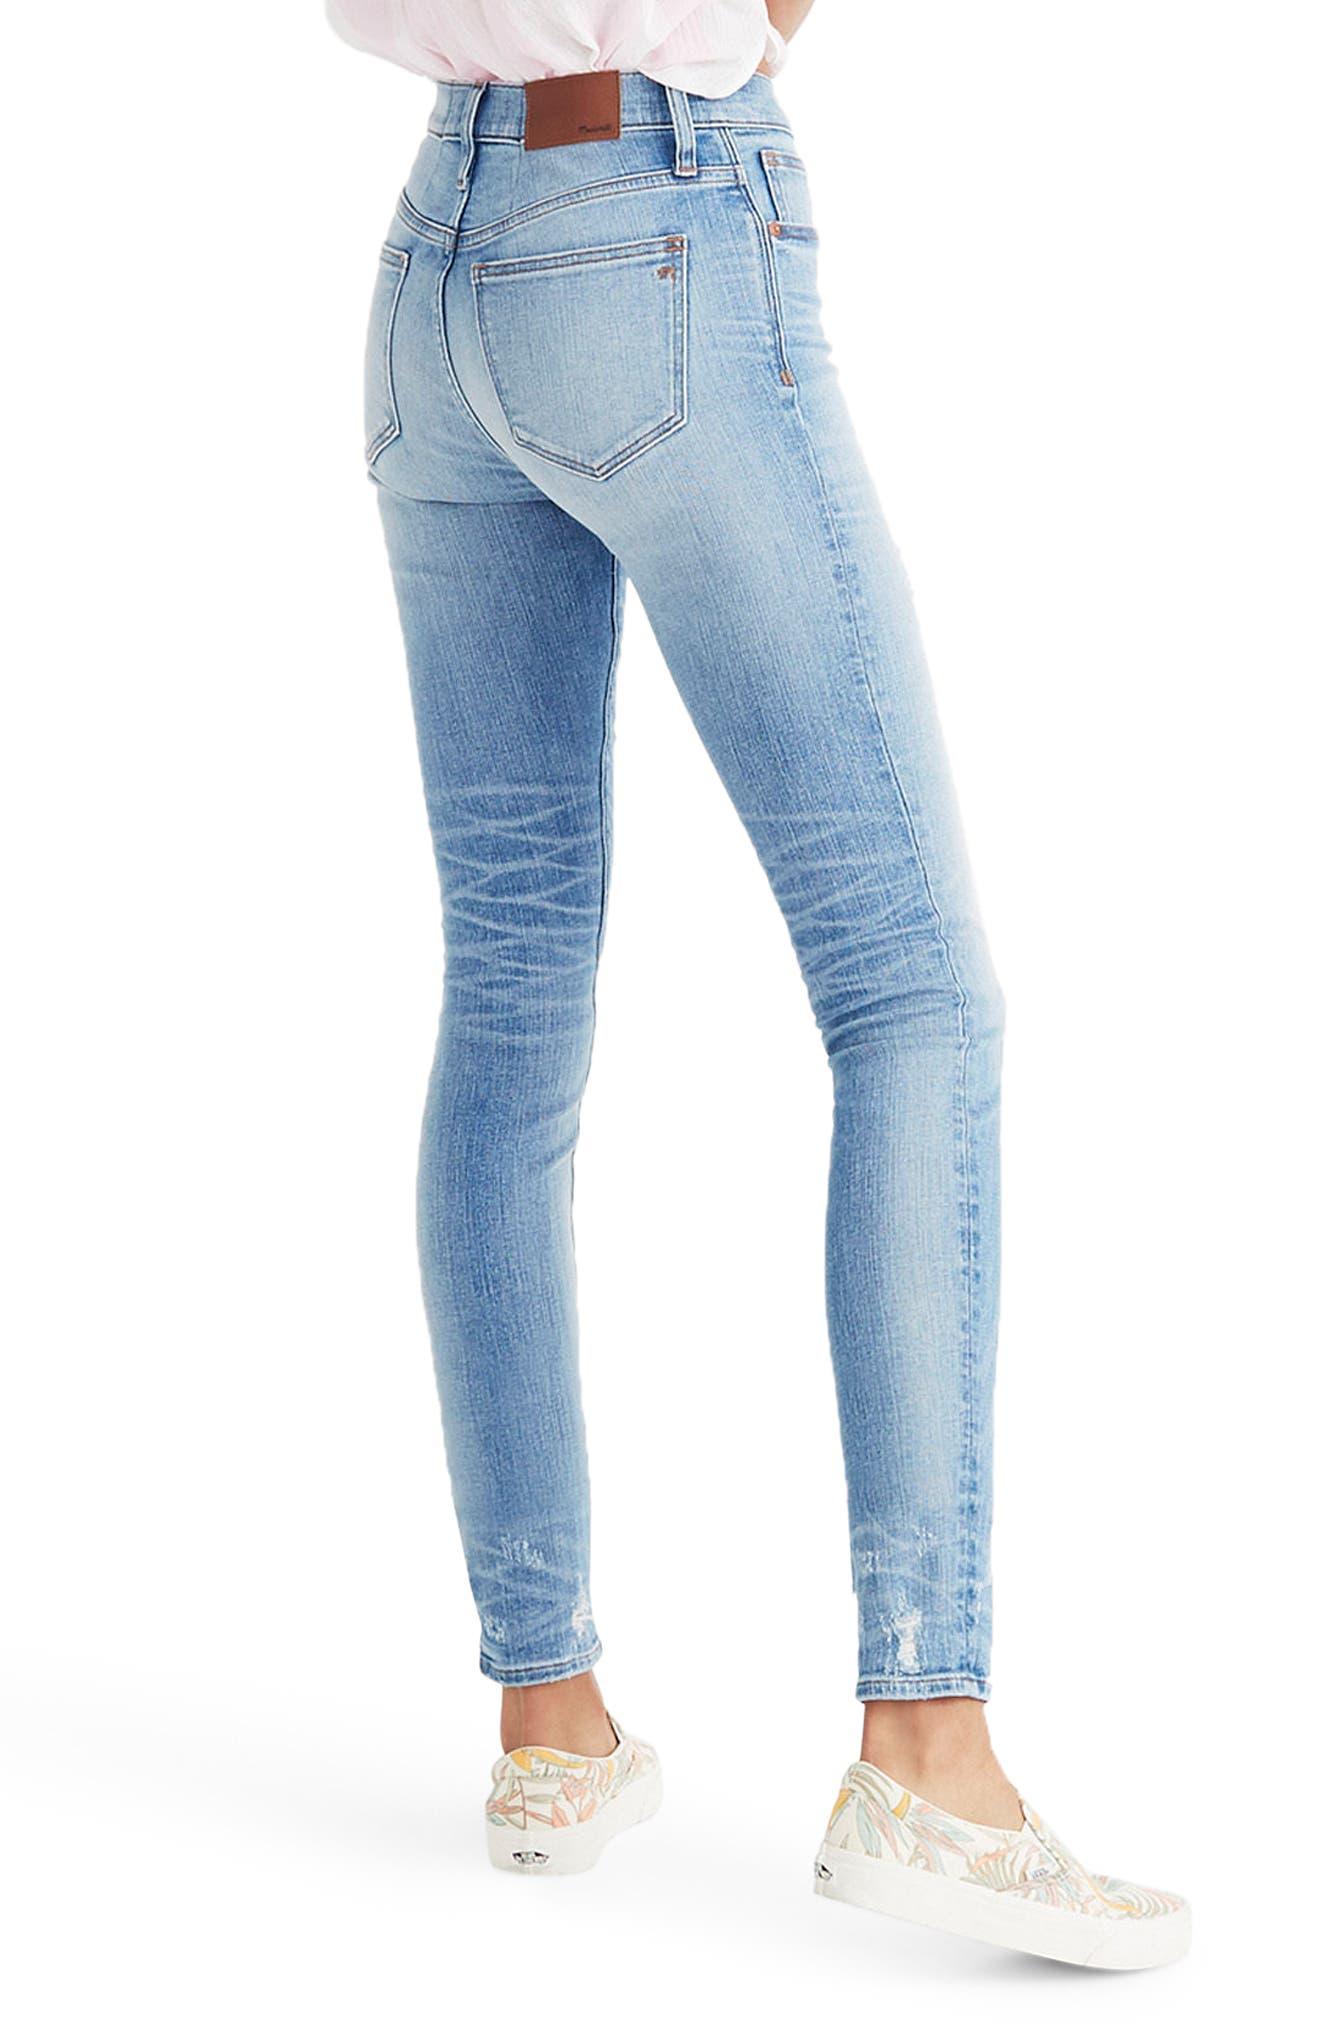 MADEWELL,                             9-Inch Destructed Hem High Waist Skinny Jeans,                             Alternate thumbnail 2, color,                             400